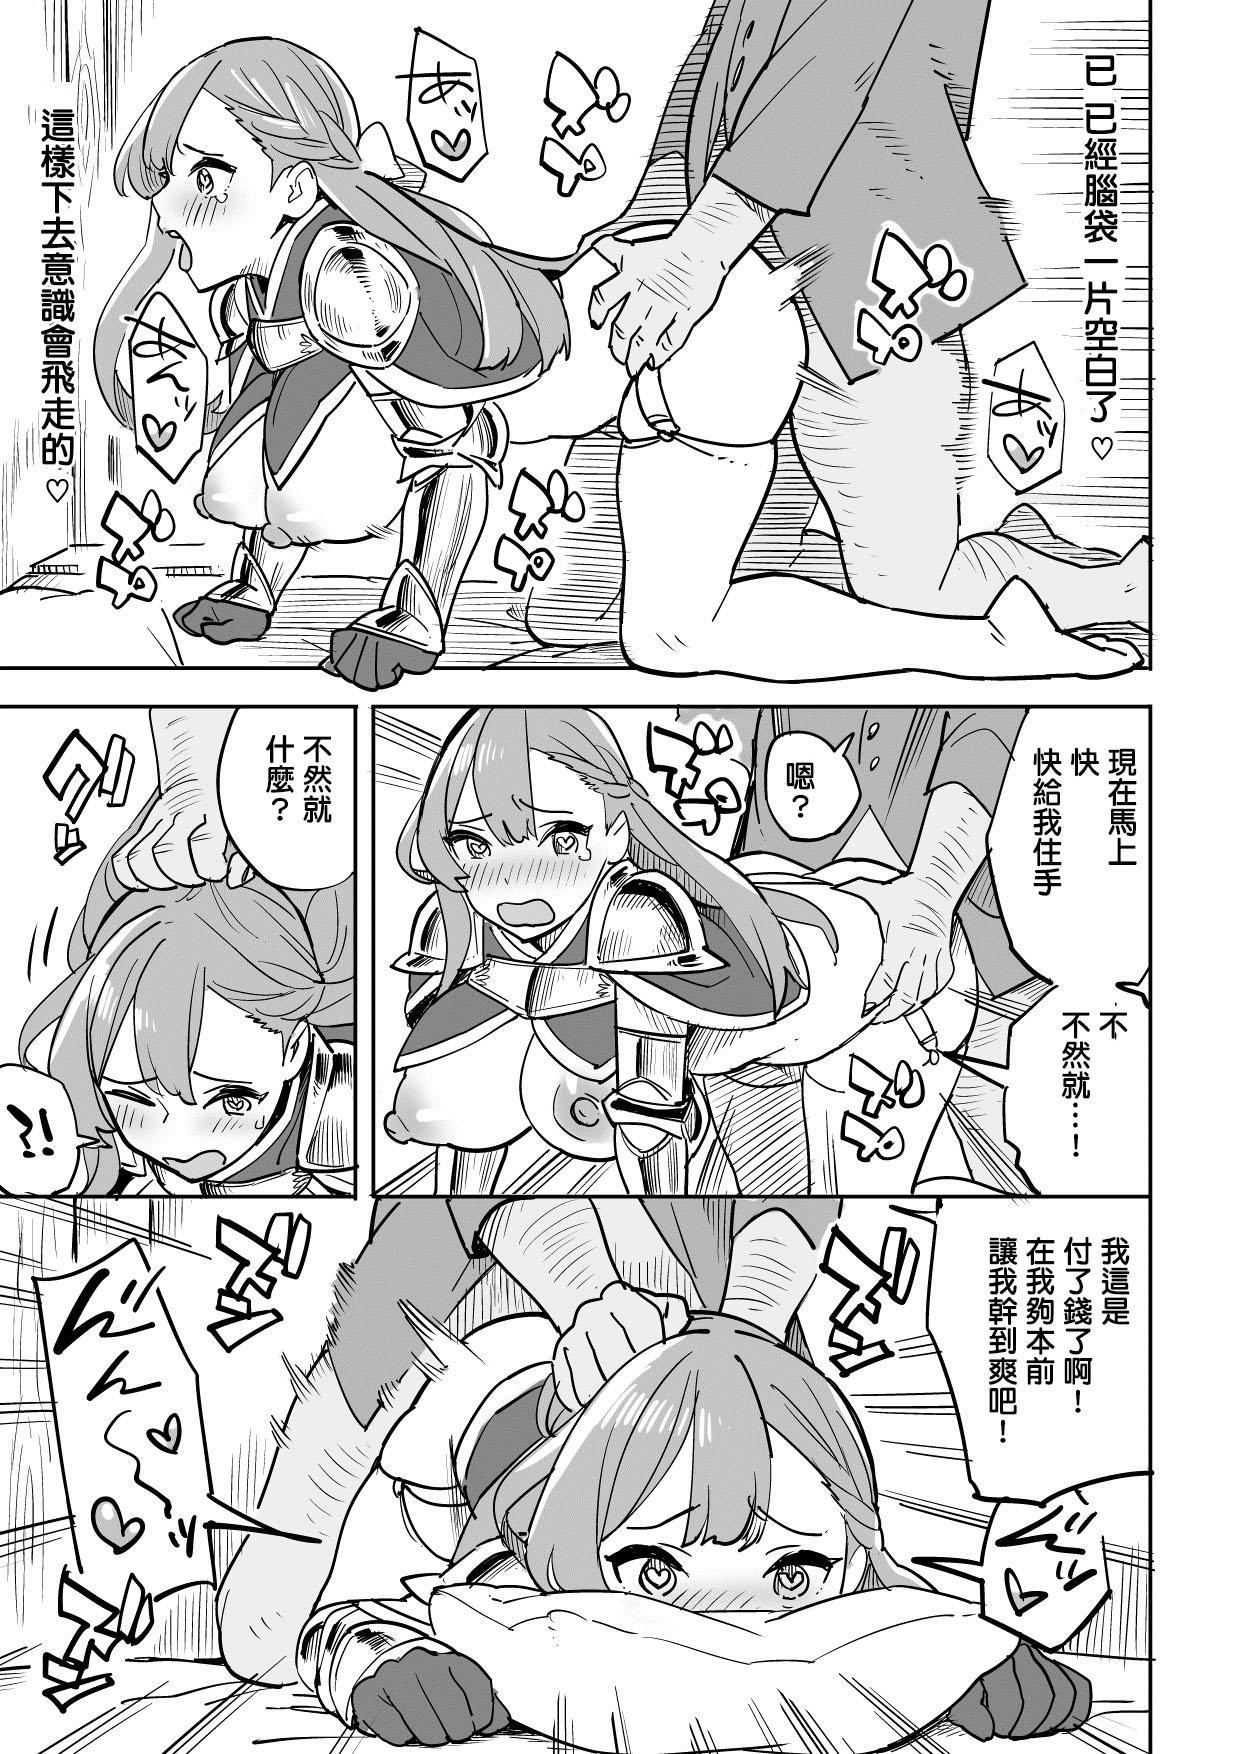 Tada no Yado ni wa Goyoujin! 20